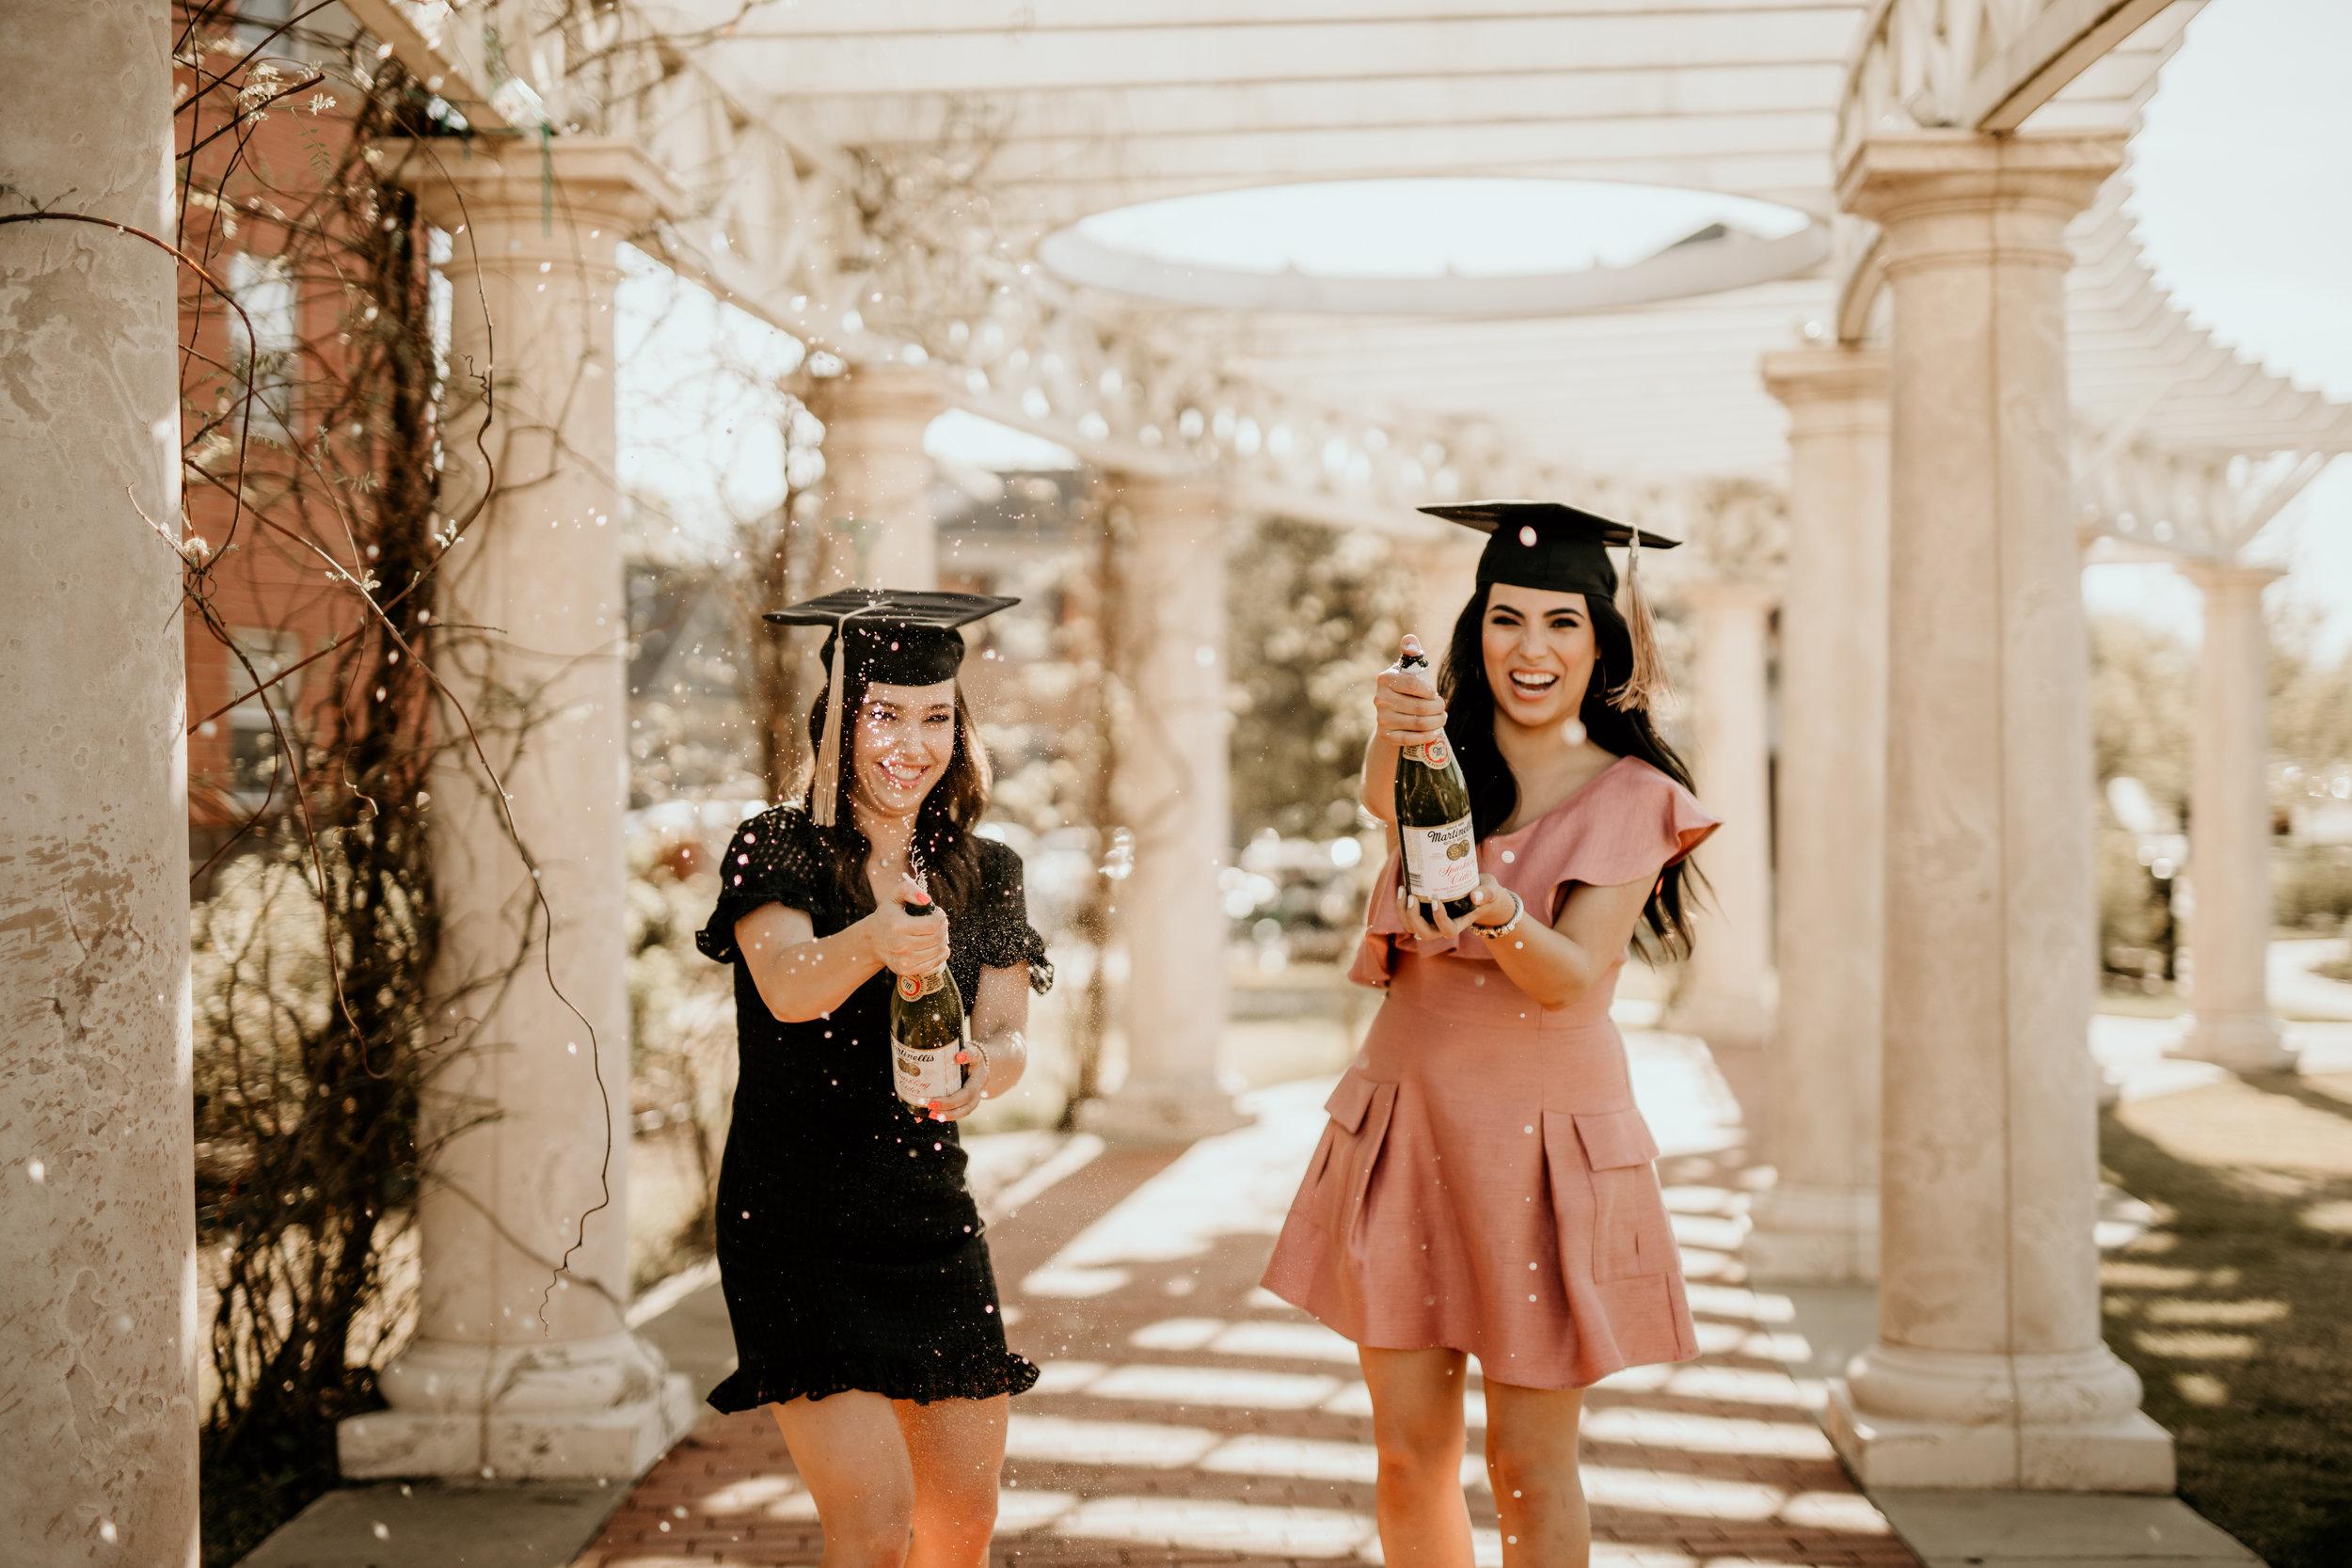 SENIOR-HARDING-UNIVERSITY-UCA-conway-central-arkansas-bridal-photographer-little-rock-photography-outdoor-wedding-boho-fashion-engagement-elopement-bouquet-bride-soiree-magazine-photoshoot-arkansasbride-pinnacle-mountain-car-vintage